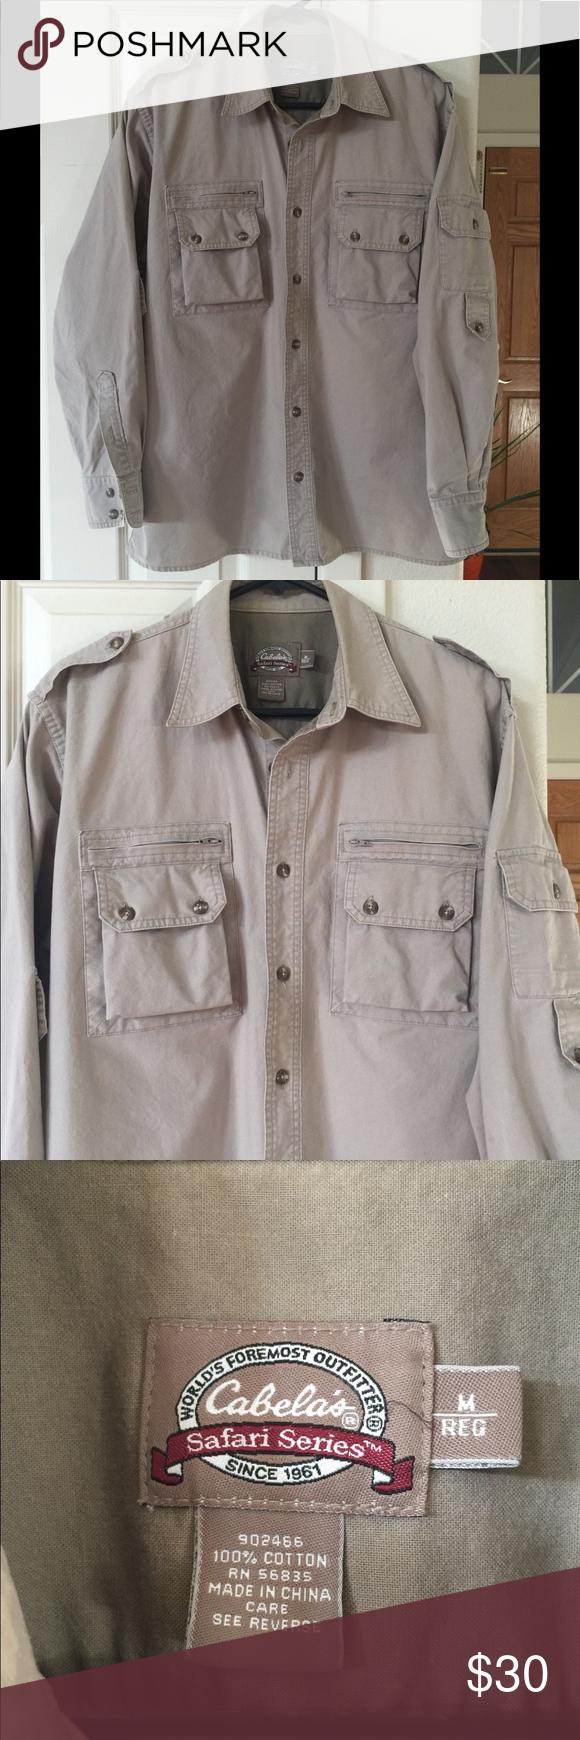 Cabelas Safari Series M Safari Style Clothes Design Casual Button Down Shirts